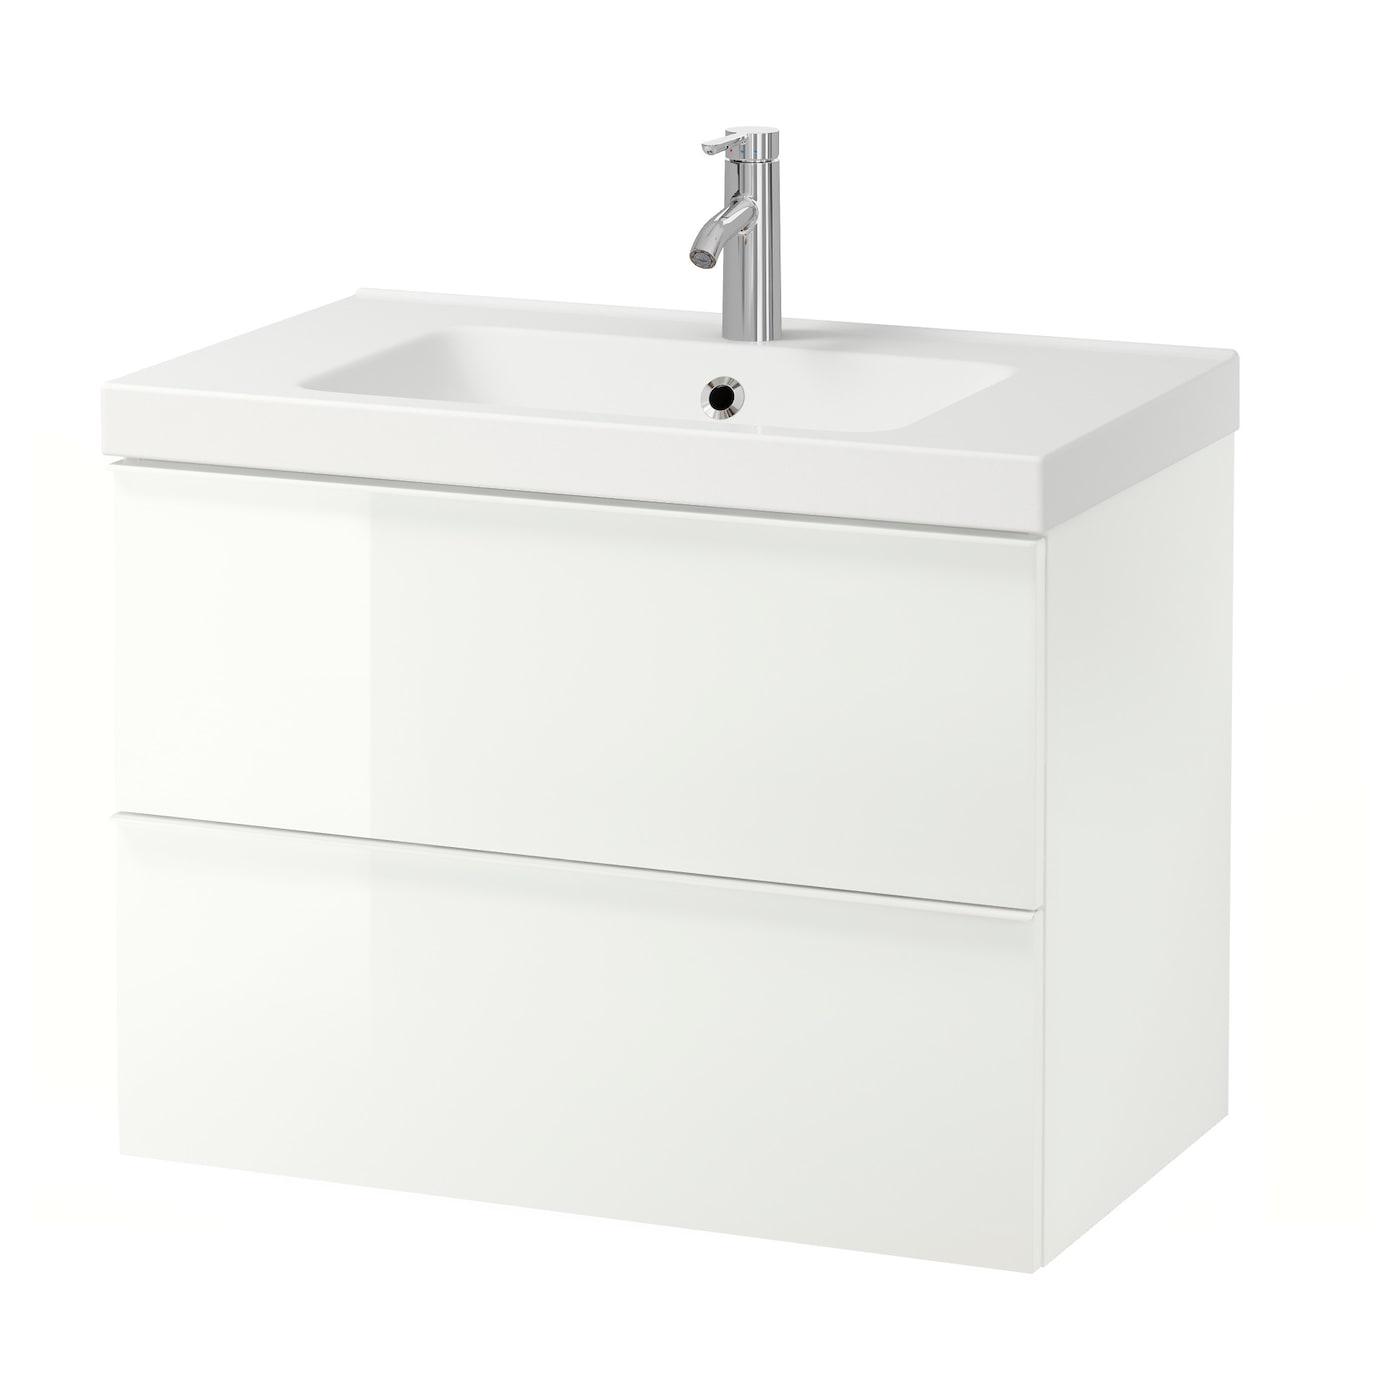 GODMORGON high gloss white, Wash stand